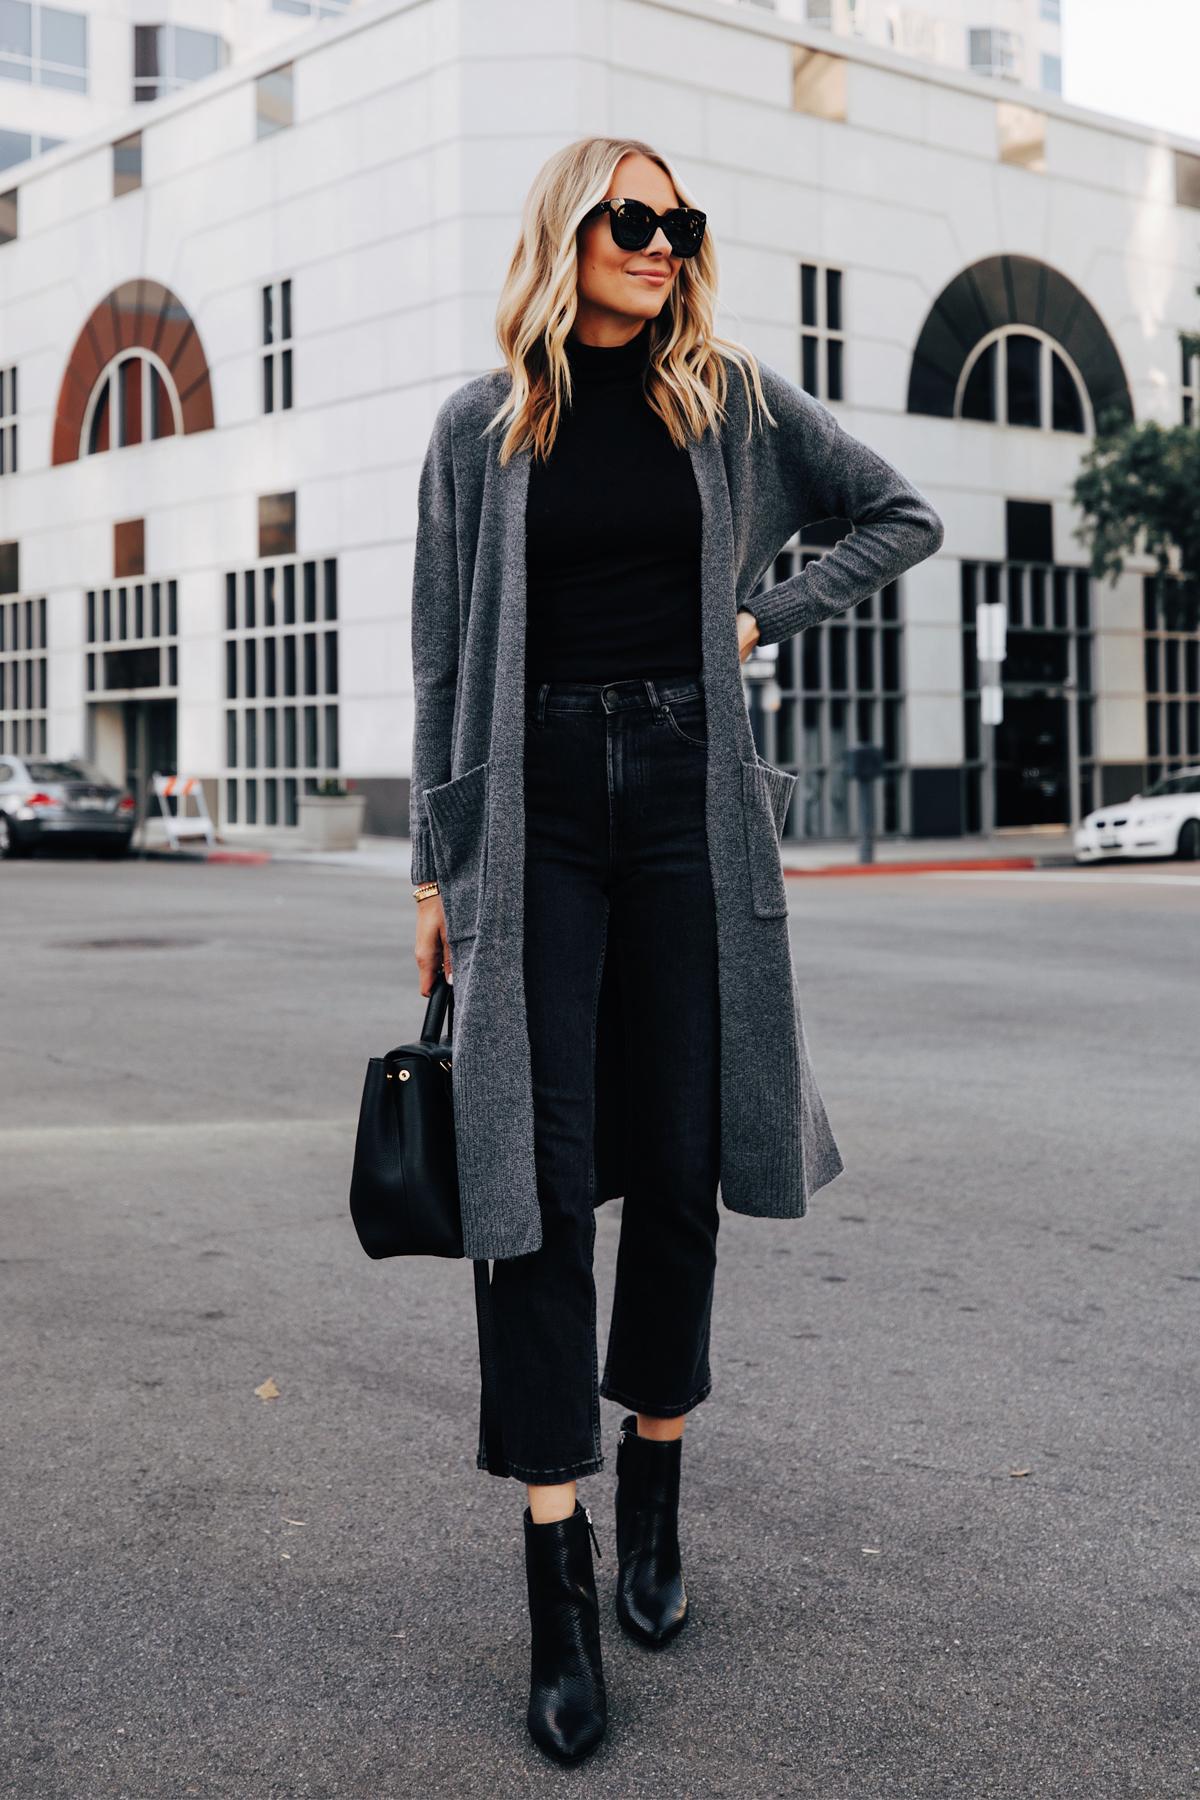 Fashion Jackson Wearing Walmart Scoop Long Grey Cardigan Black Top Black Jeans Black Snakeskin Booties 2